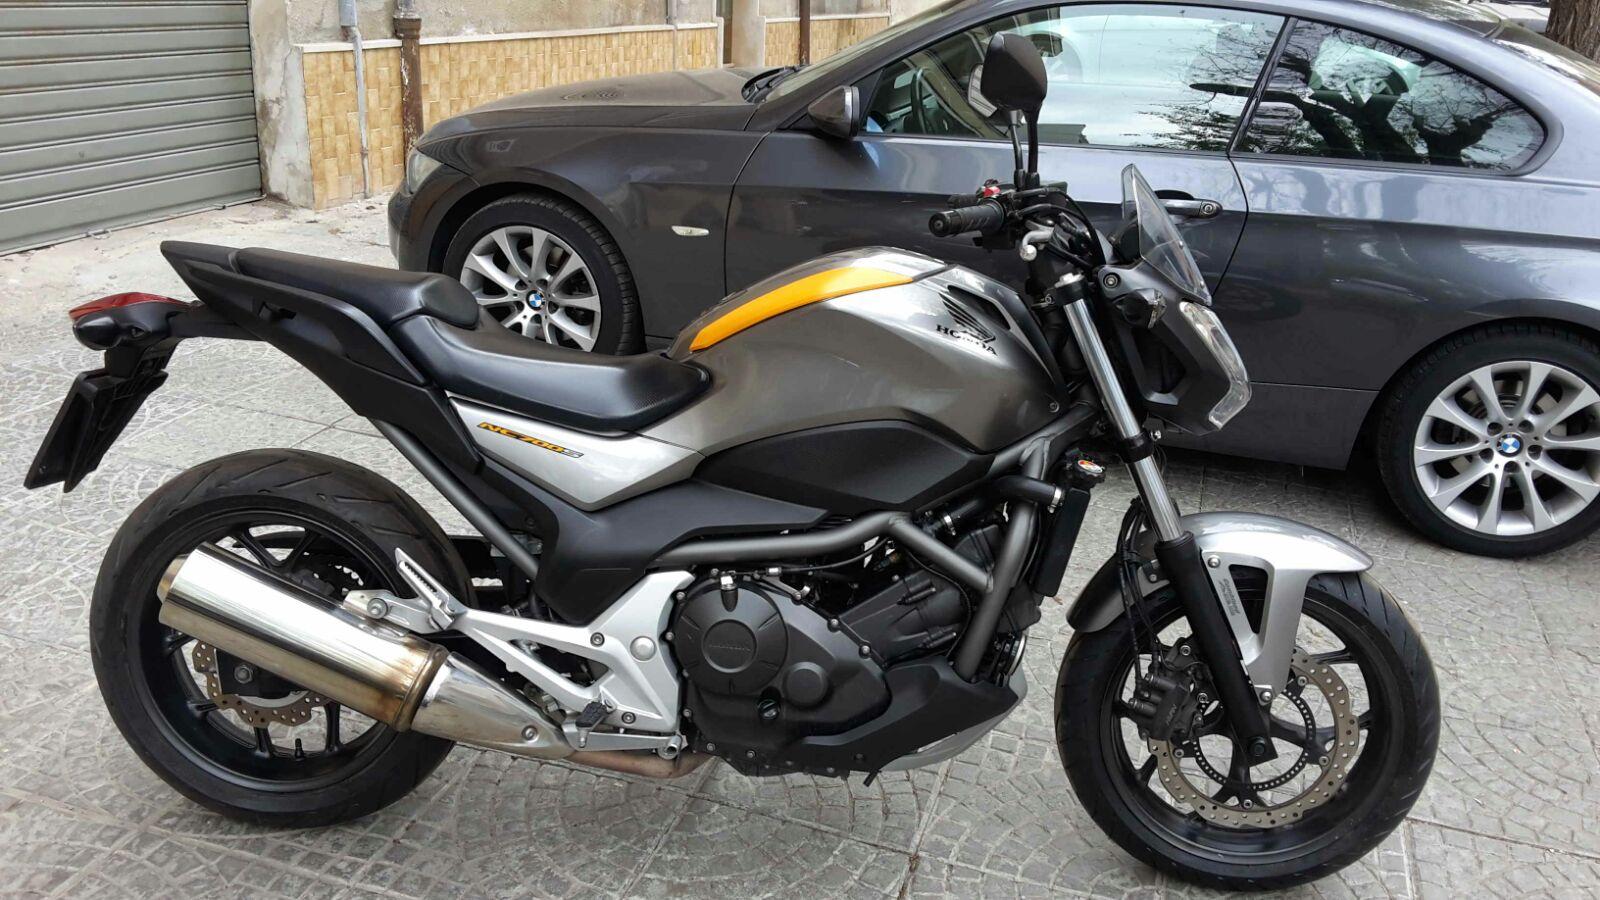 preise modelle motorradvermietung sardinien motoparadiso5 motorradtour. Black Bedroom Furniture Sets. Home Design Ideas